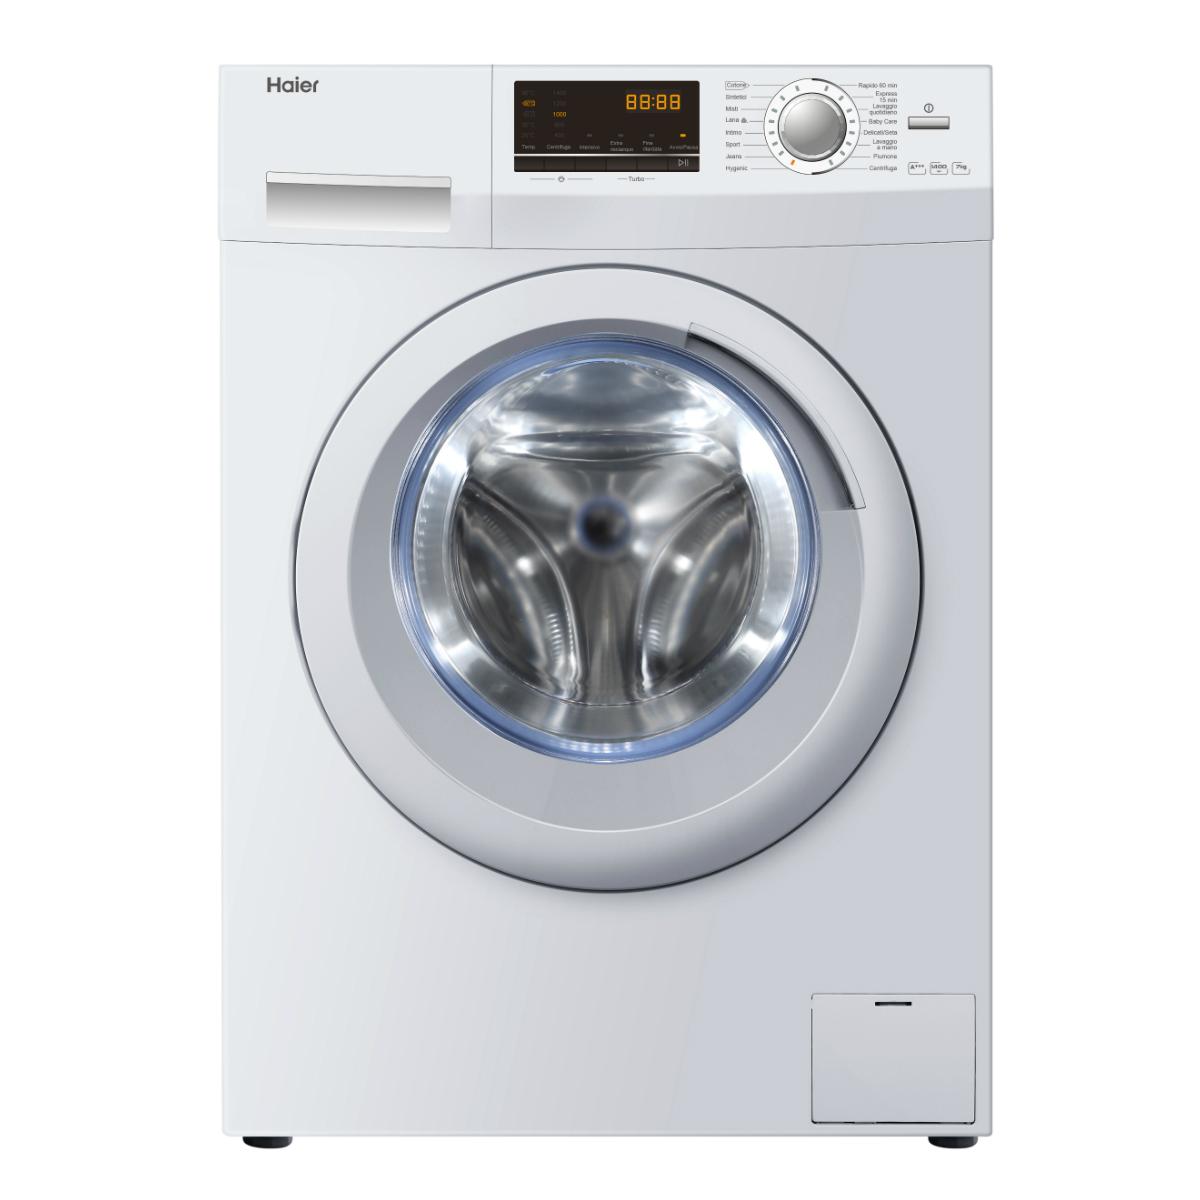 lavatrice haier hw70 14636 caratteristiche lavatrice haier hw70 14636. Black Bedroom Furniture Sets. Home Design Ideas